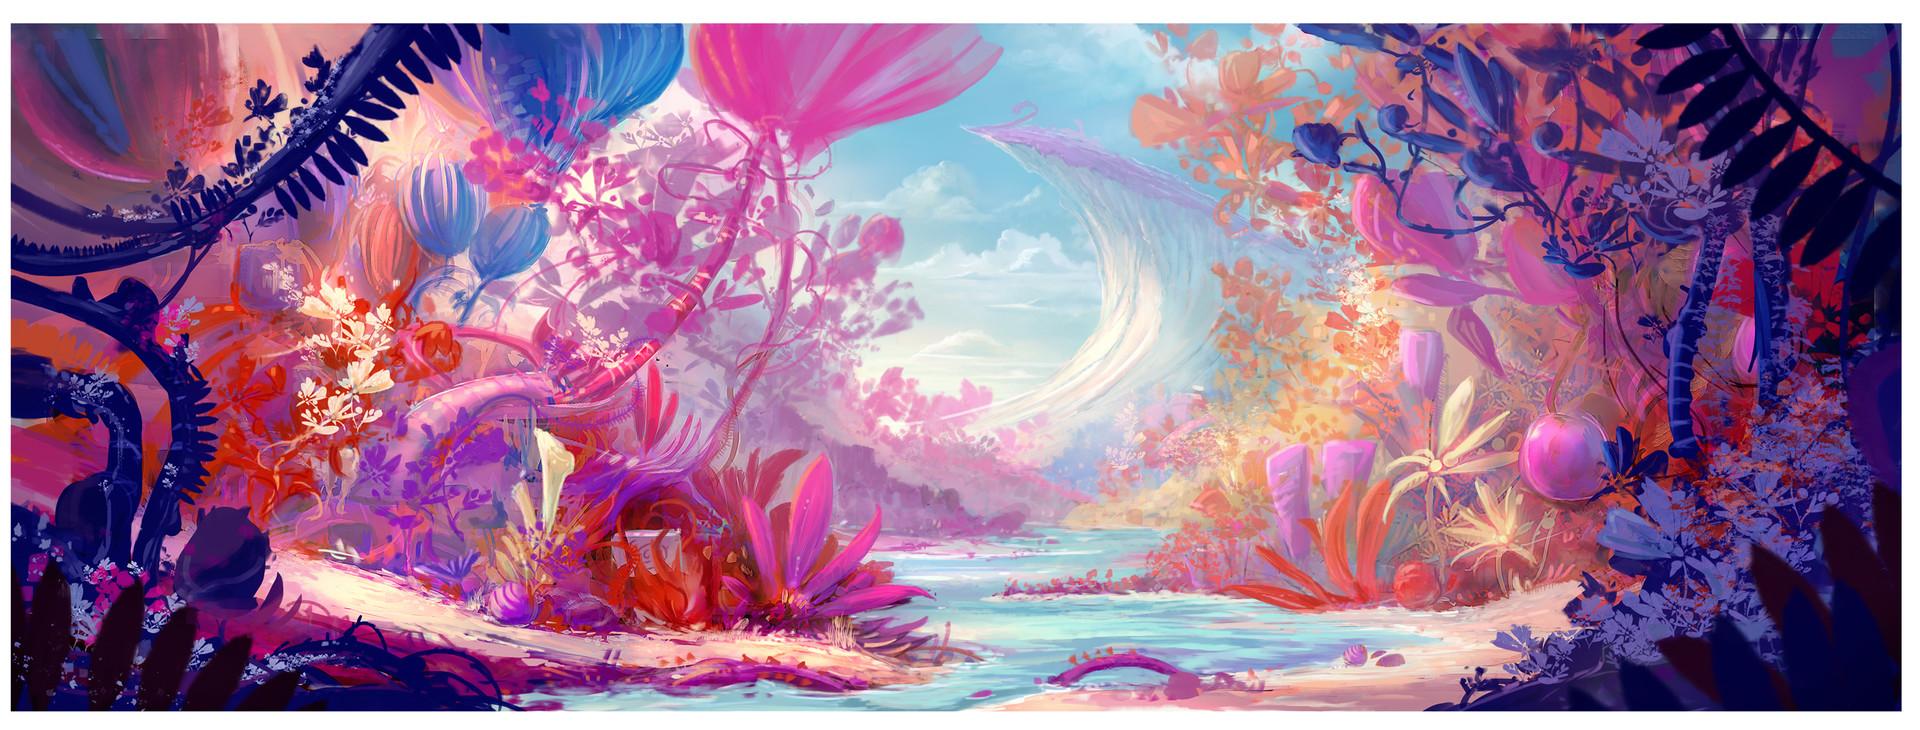 Adrian michael mulryan forestcolour 02